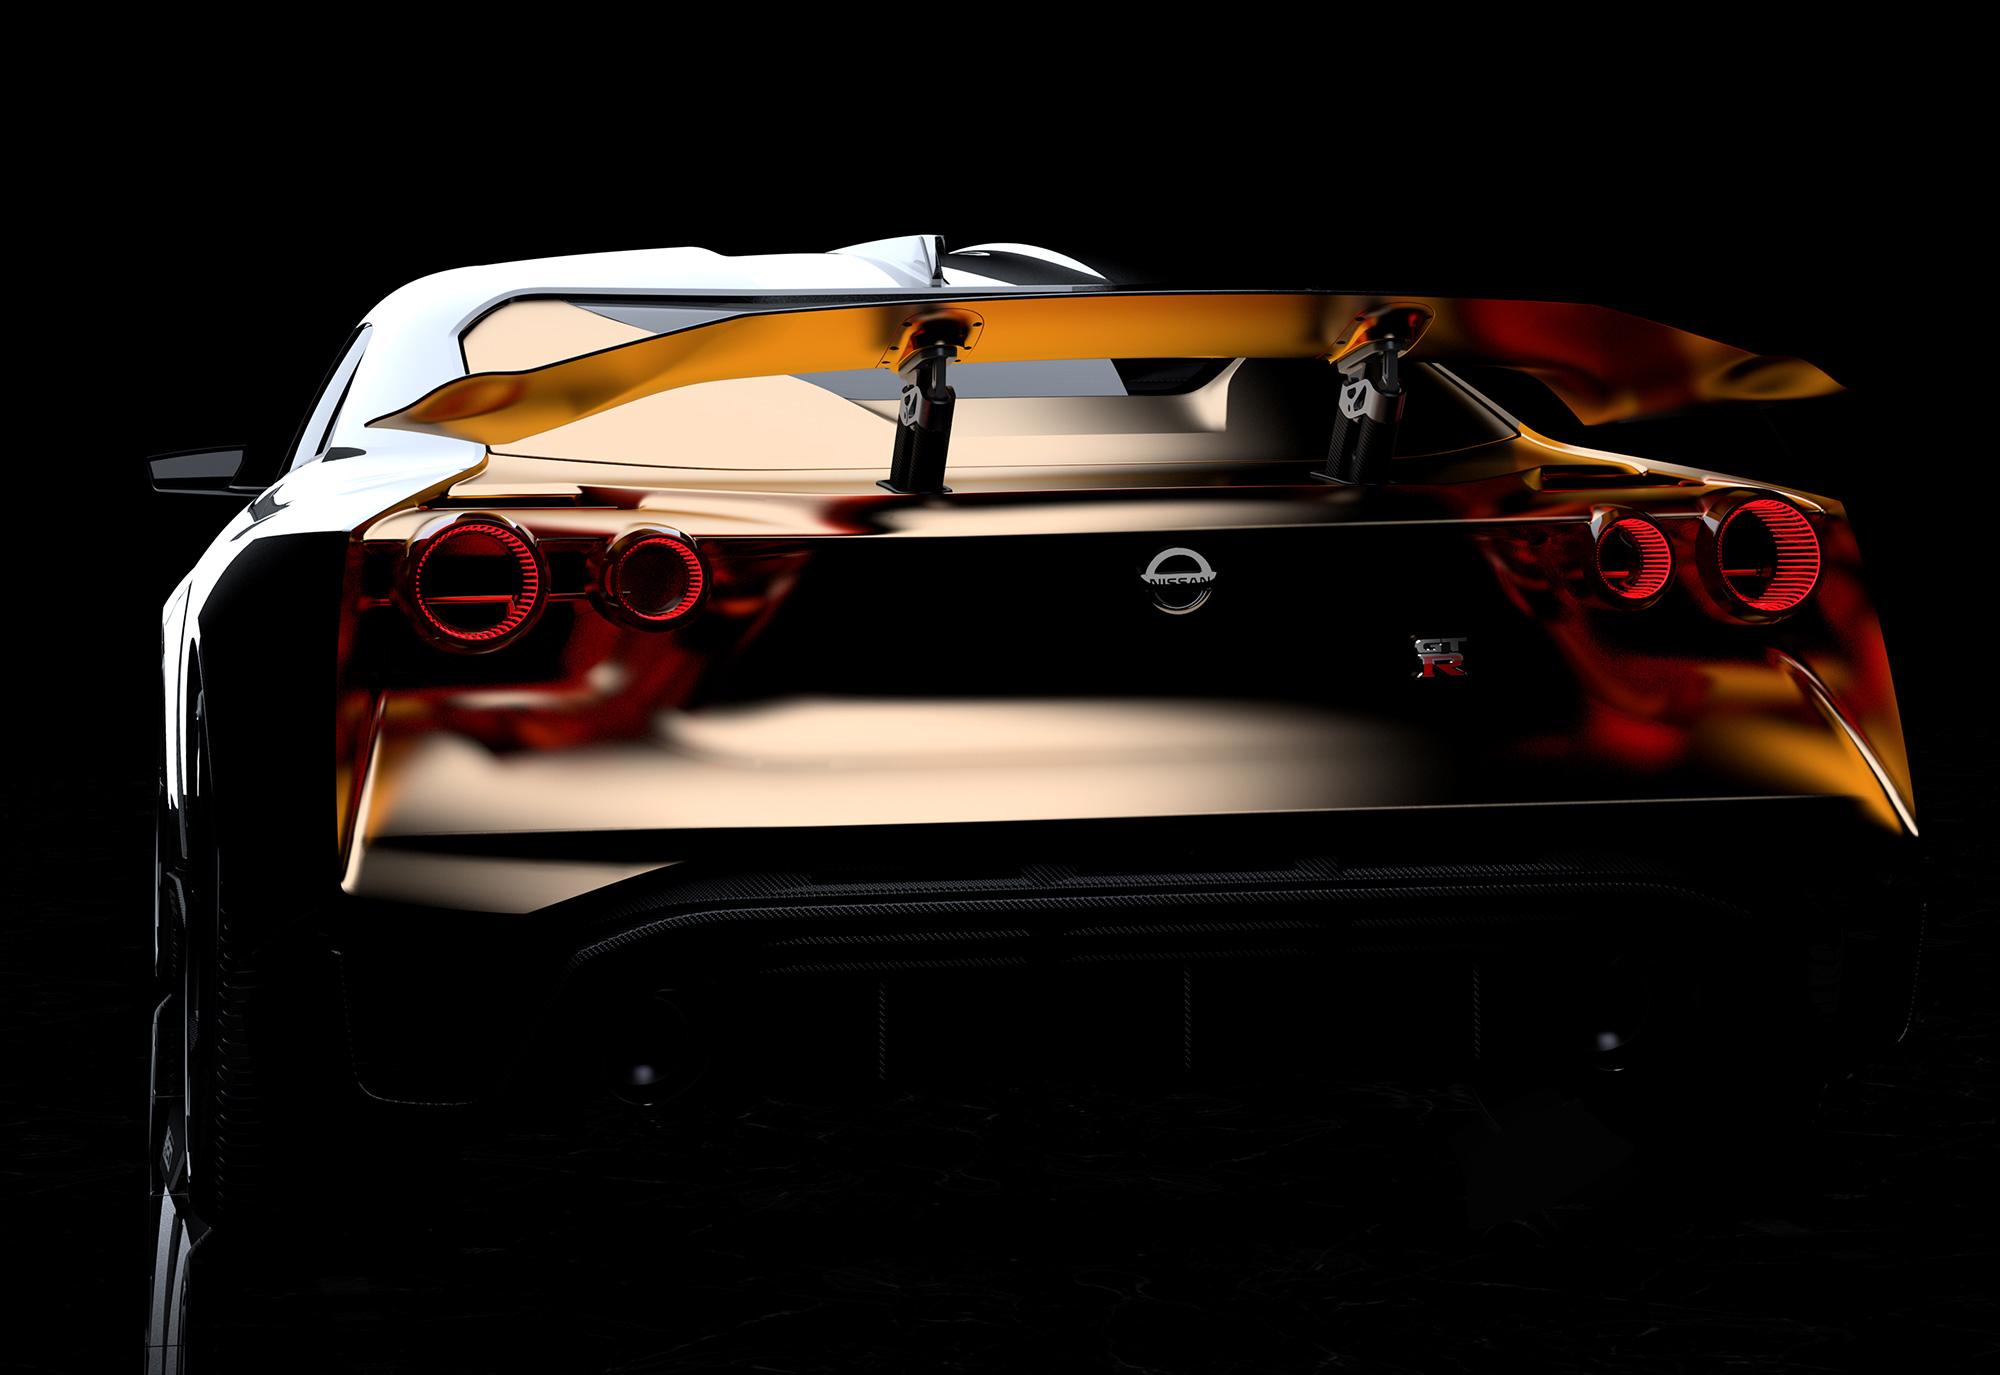 2018-06-25-Nissan-GT-R50-by-Italdesign-EXTERIOR-IMAGE-8.jpg